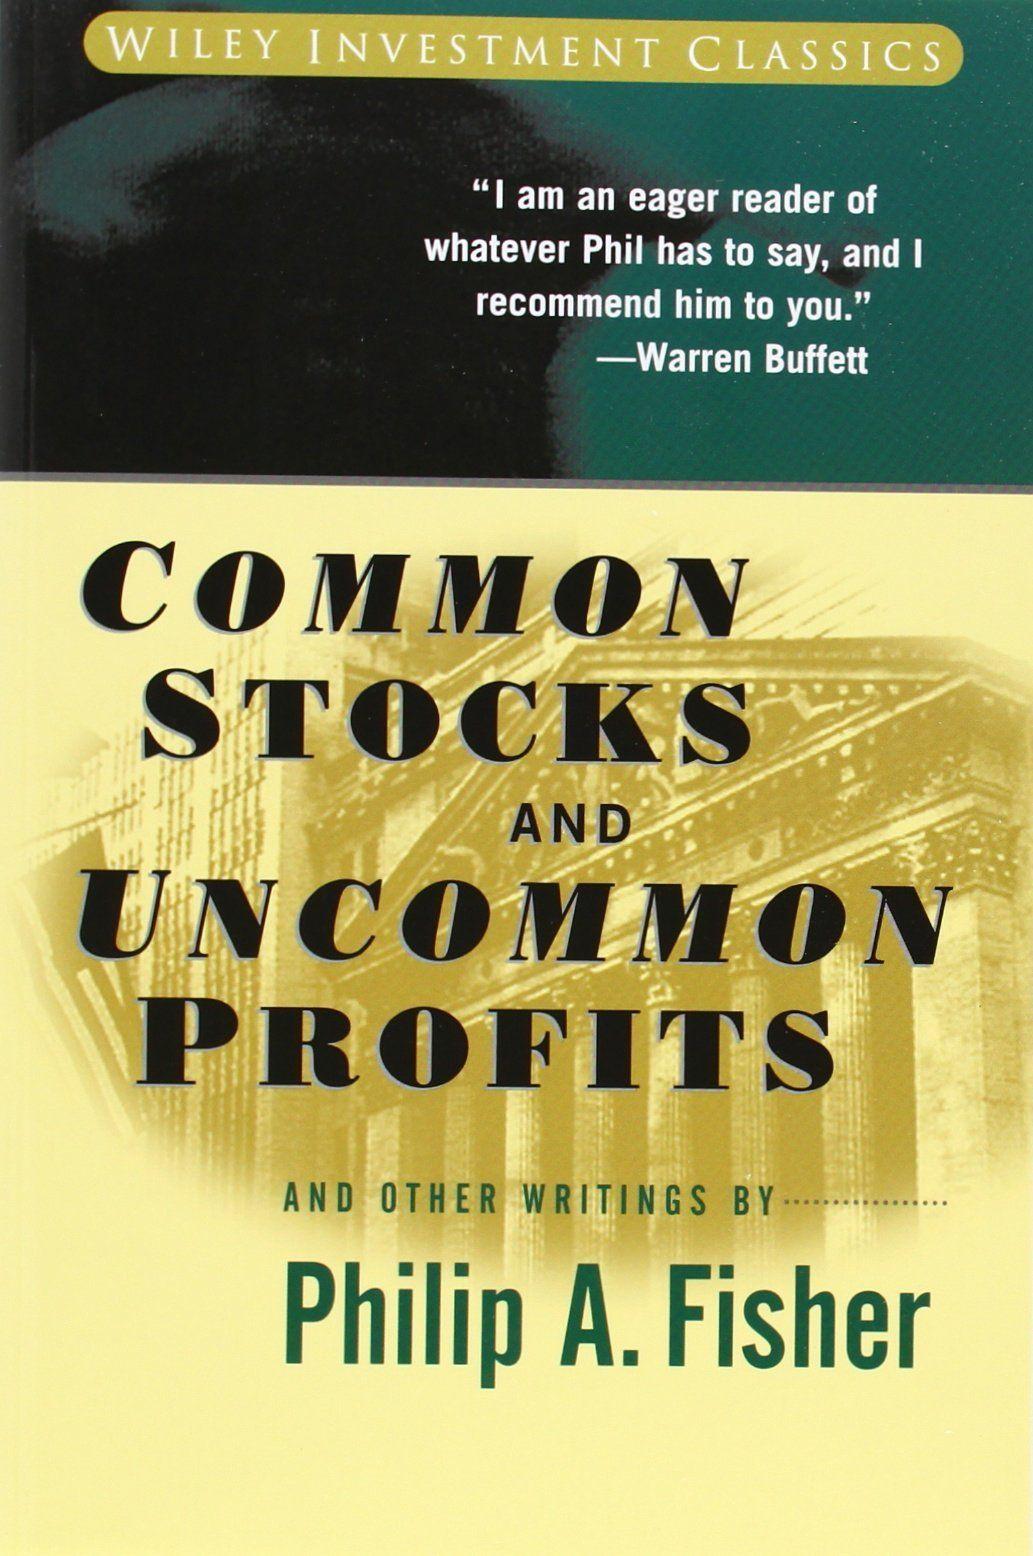 9 Books Billionaire Warren Buffett Thinks Everyone Should